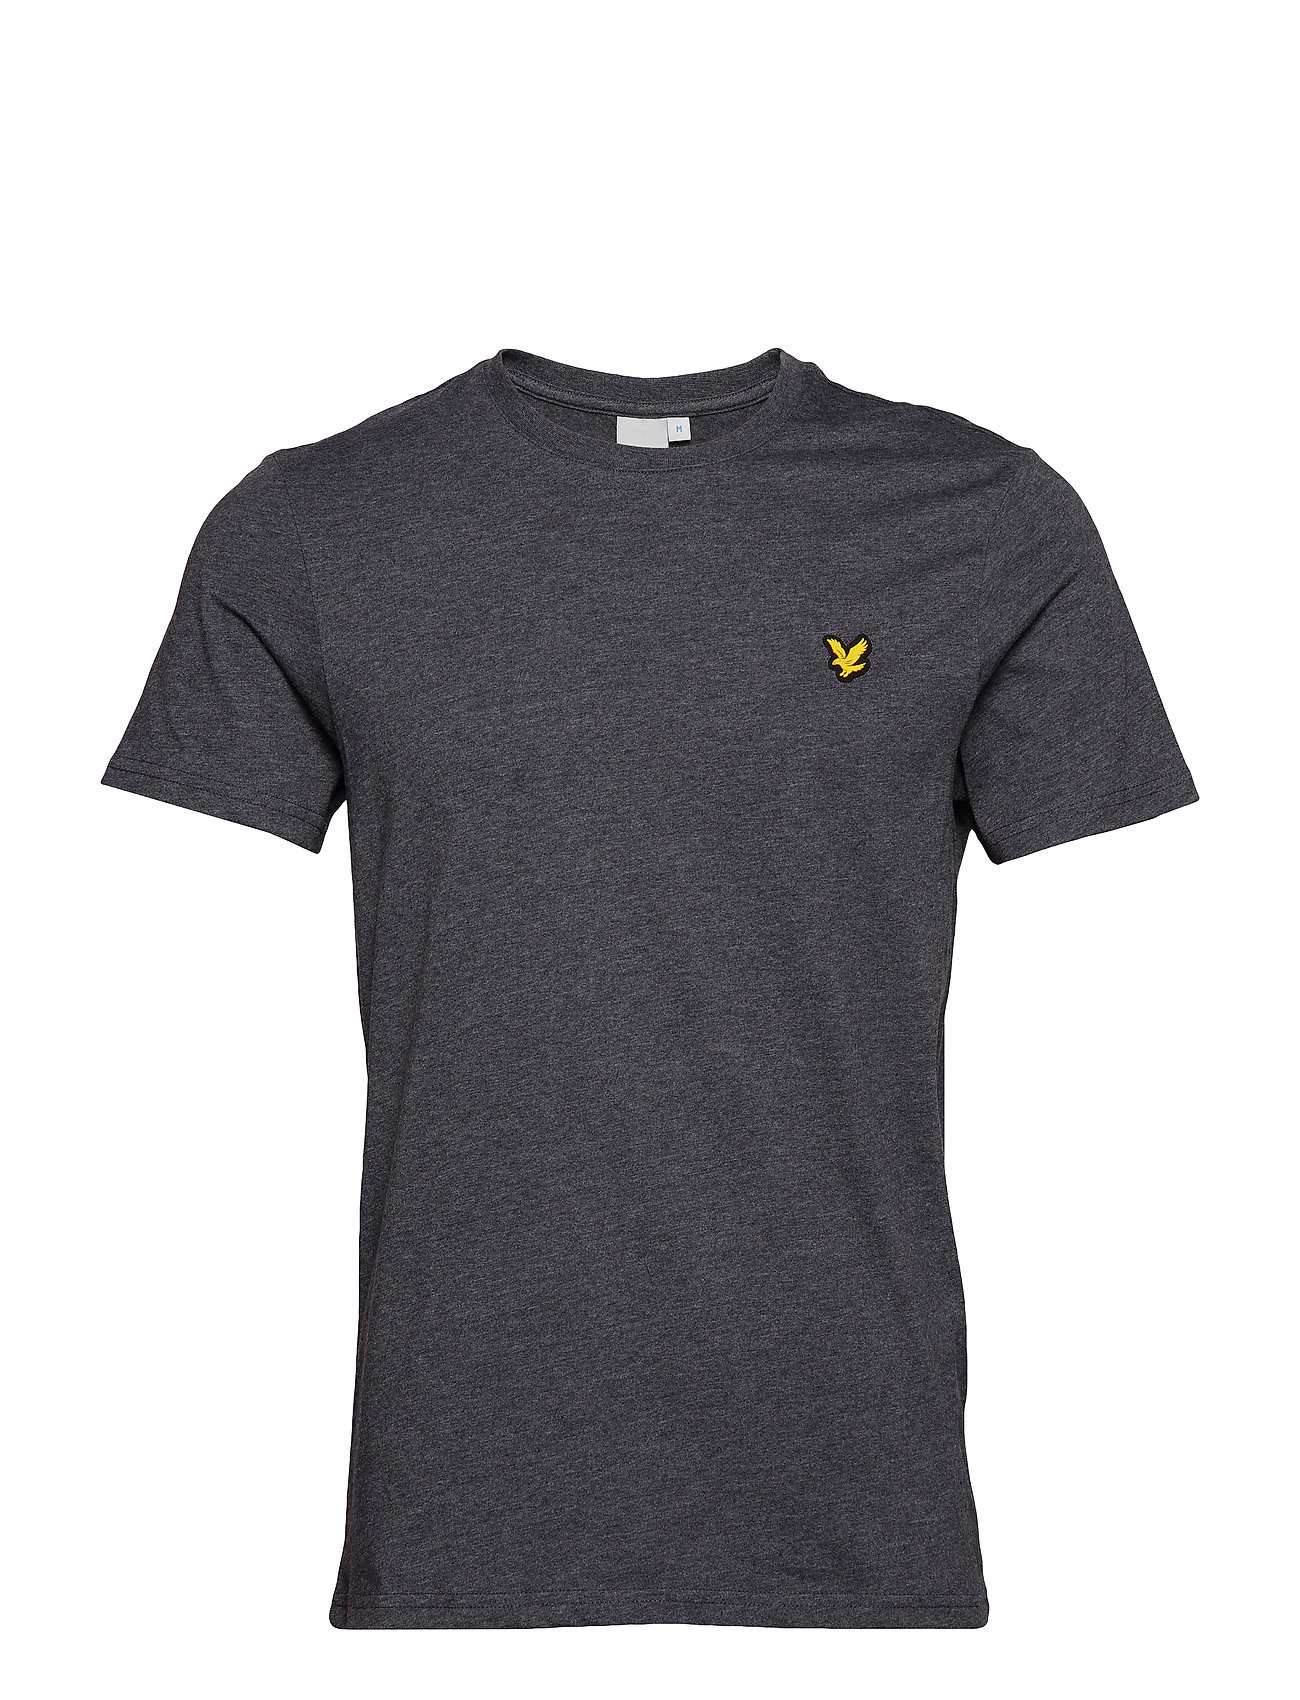 Lyle & Scott Sport Martin SS T-Shirt - TRUE BLACK MARL